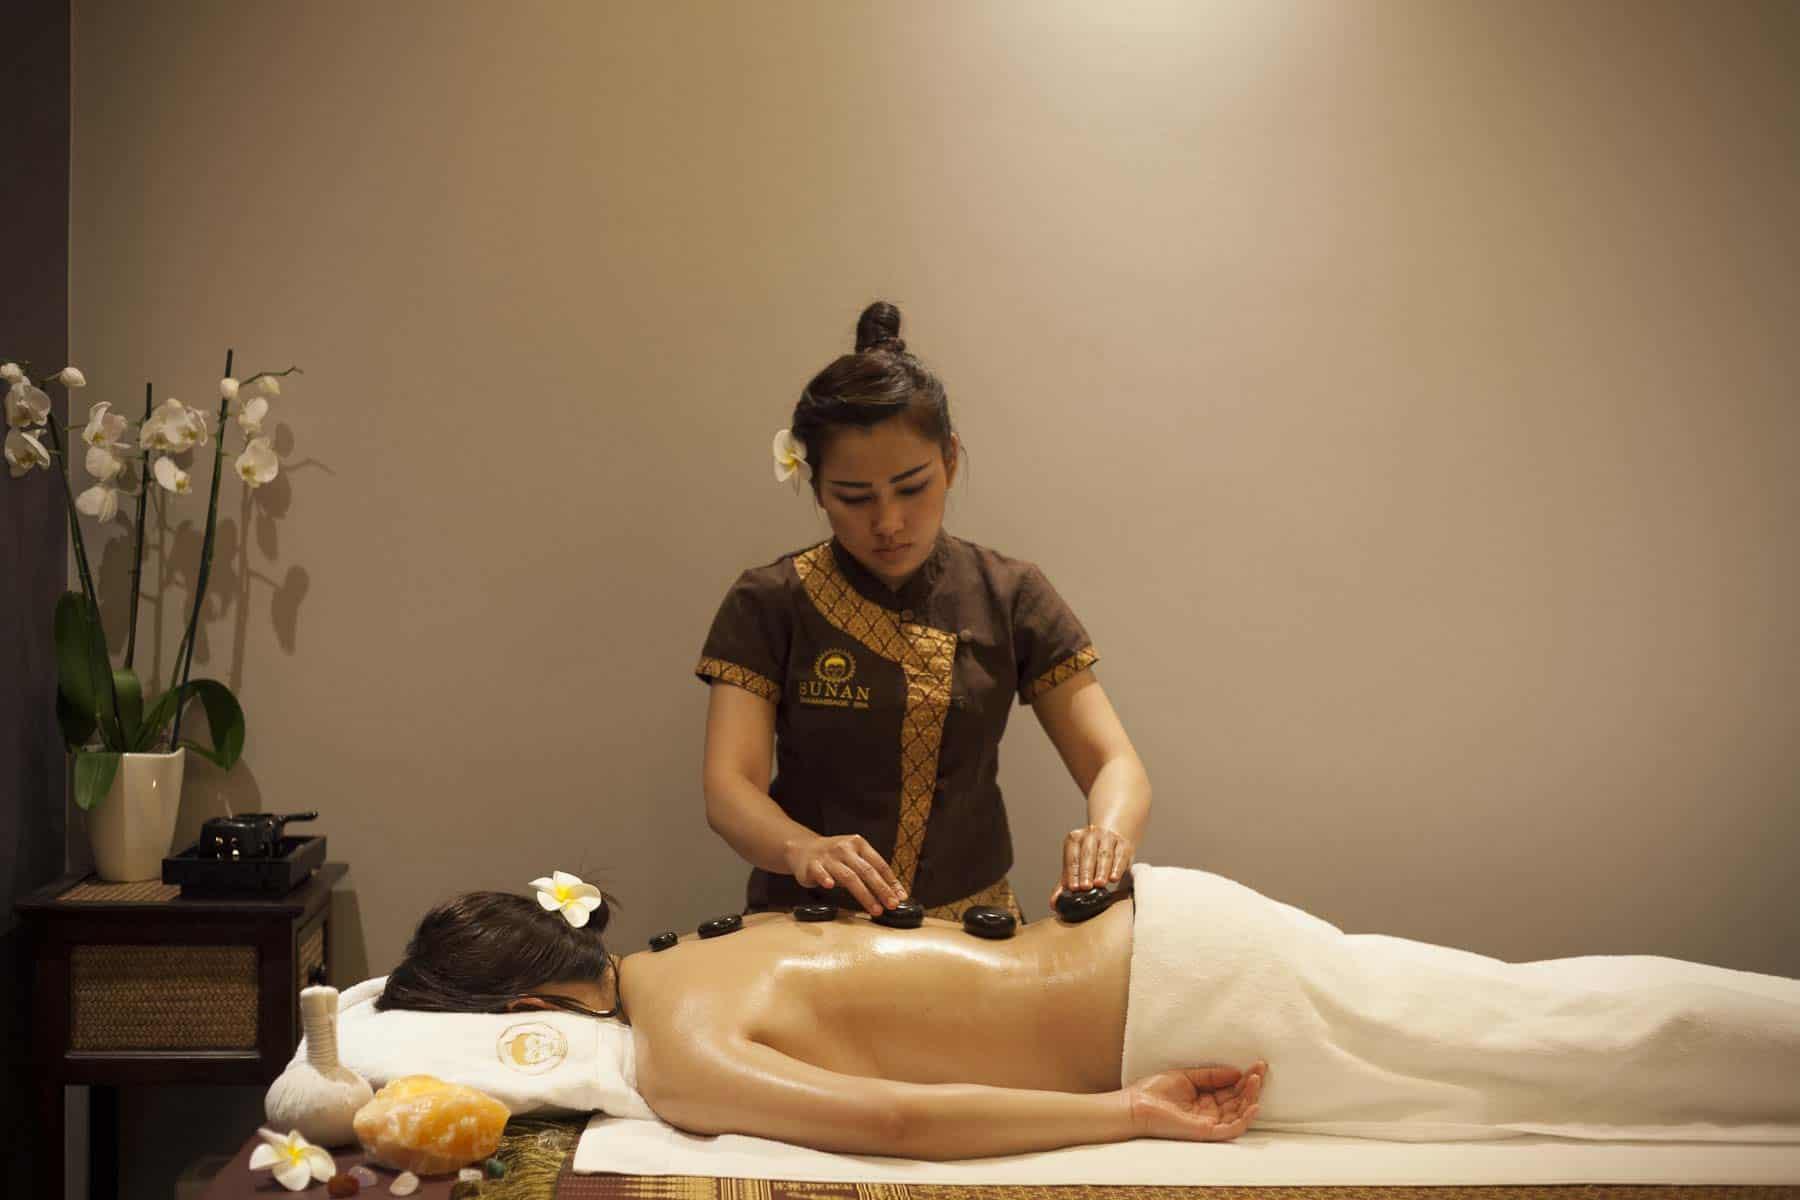 Sunan Signature Massage